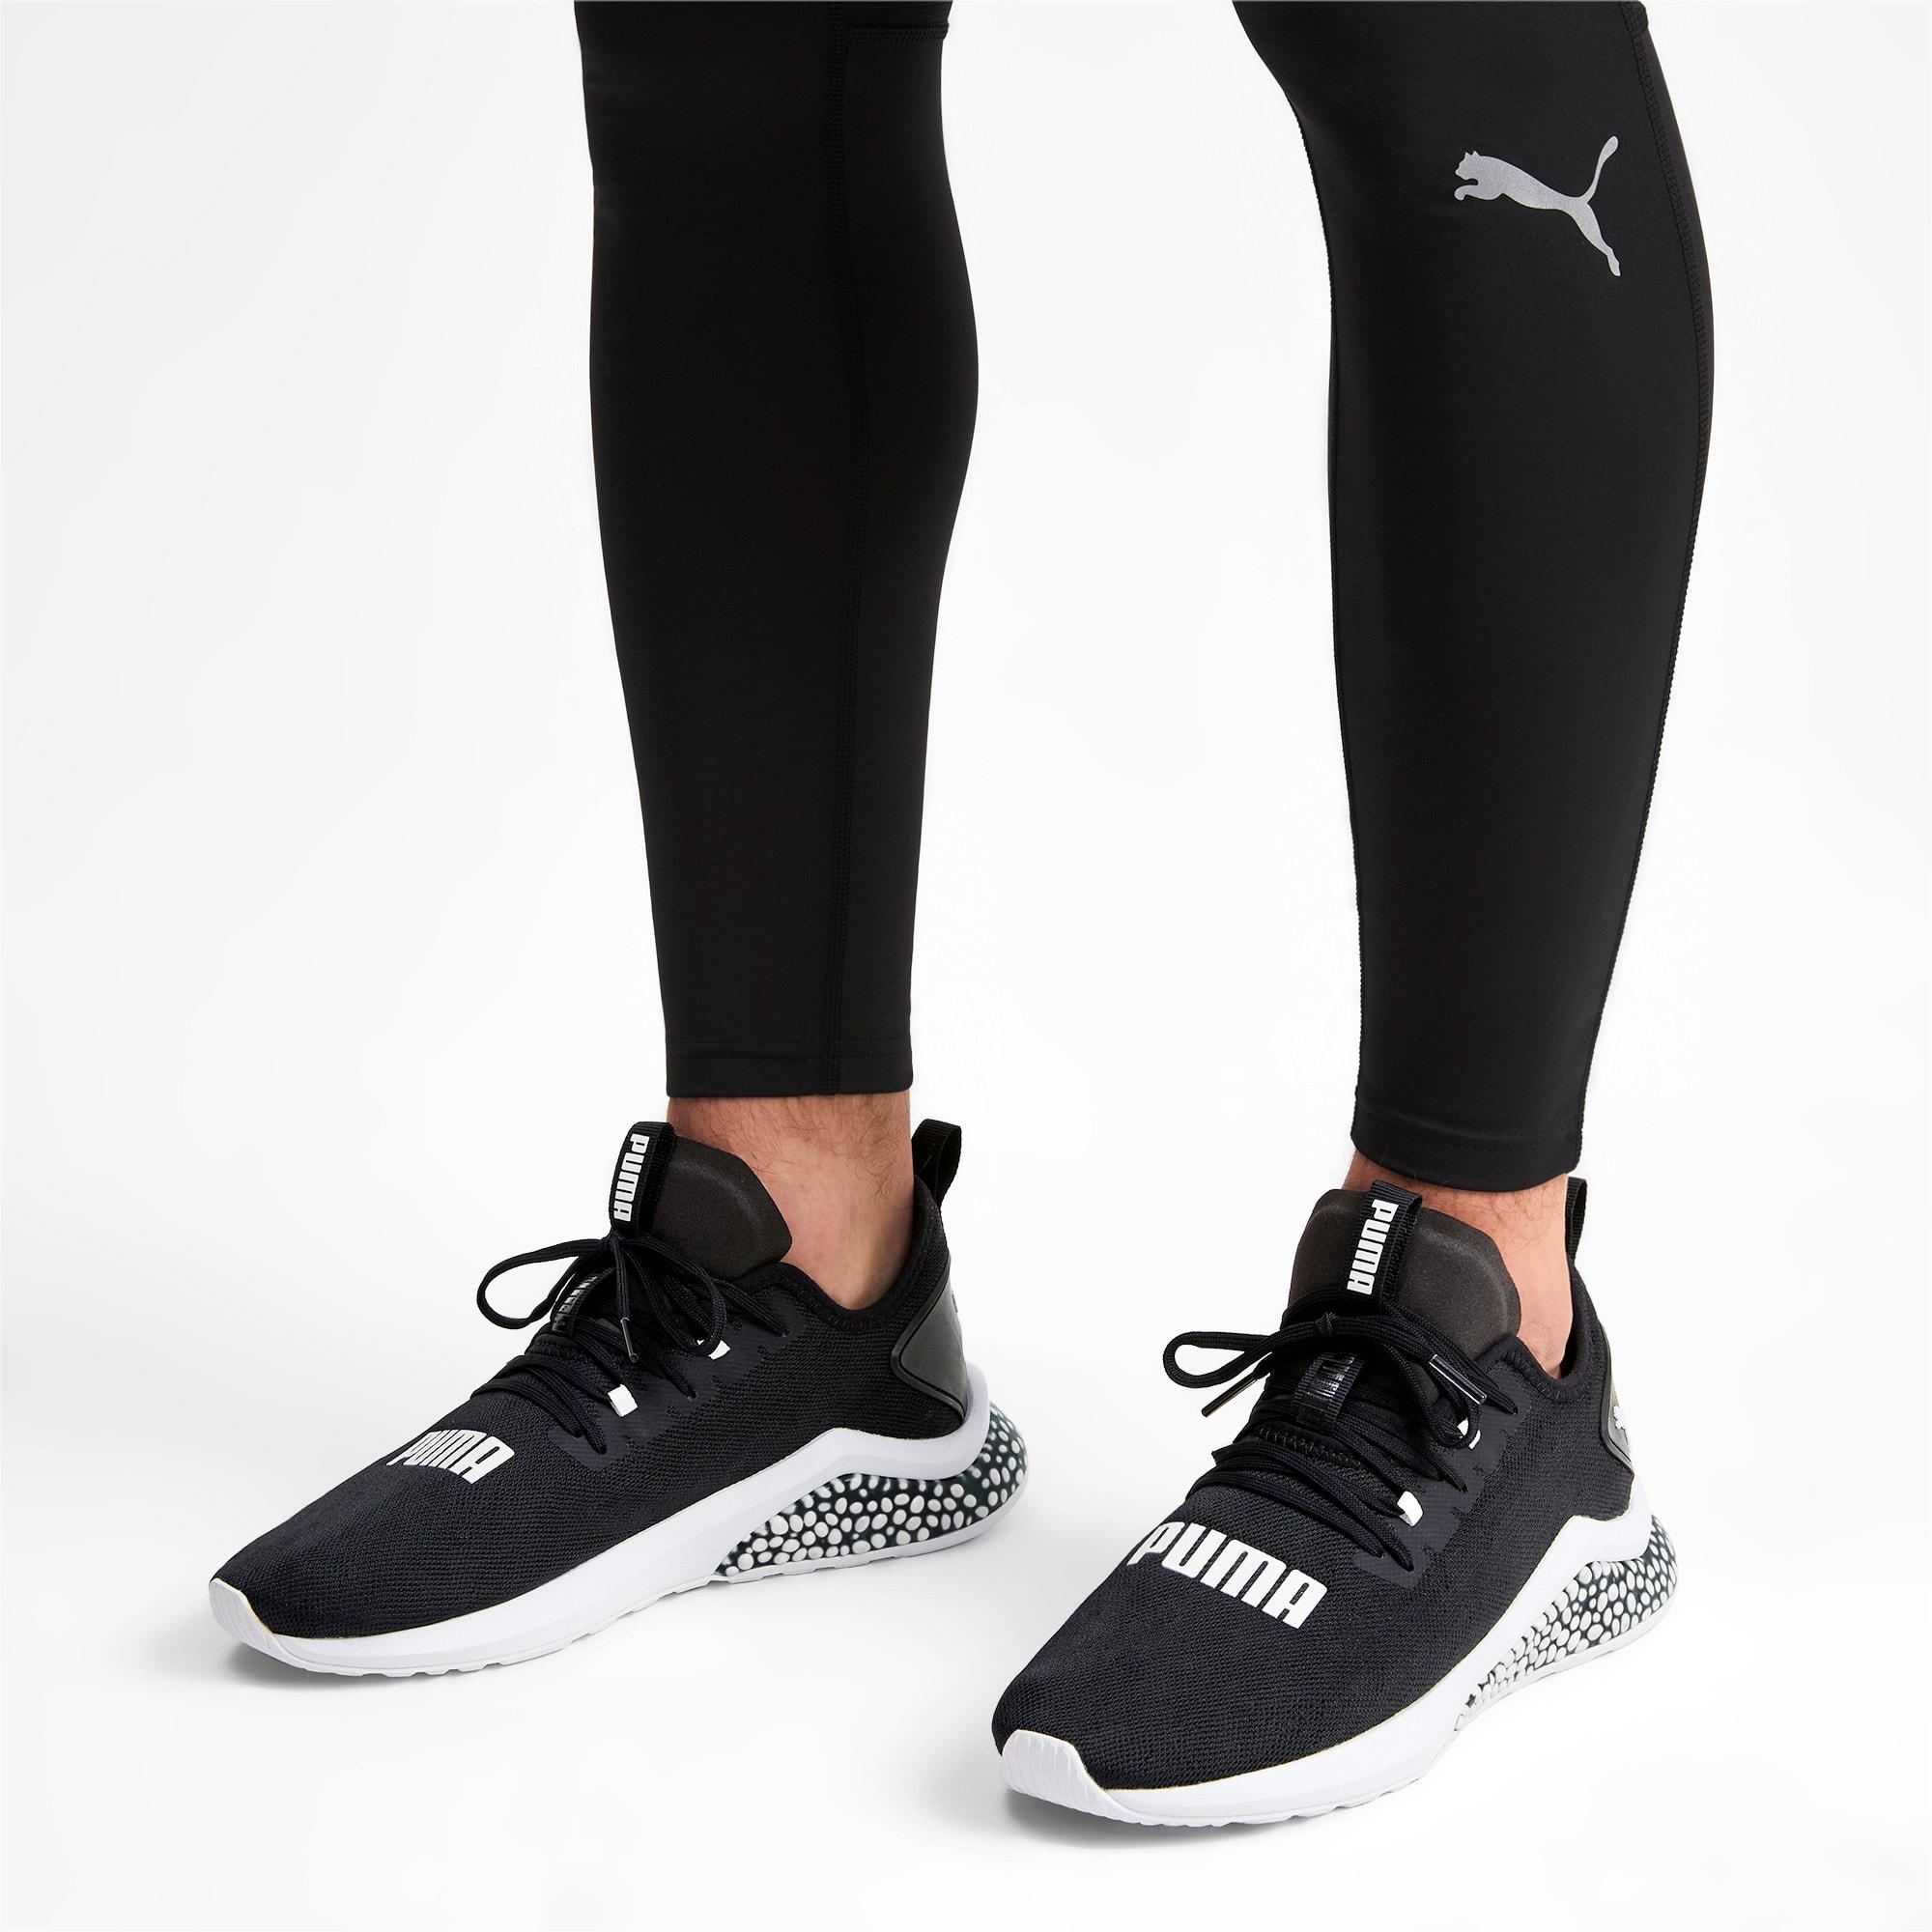 Thumbnail 4 of Hybrid NX Camo Men's Running Sneakers, Puma Black-Puma White, medium-IND